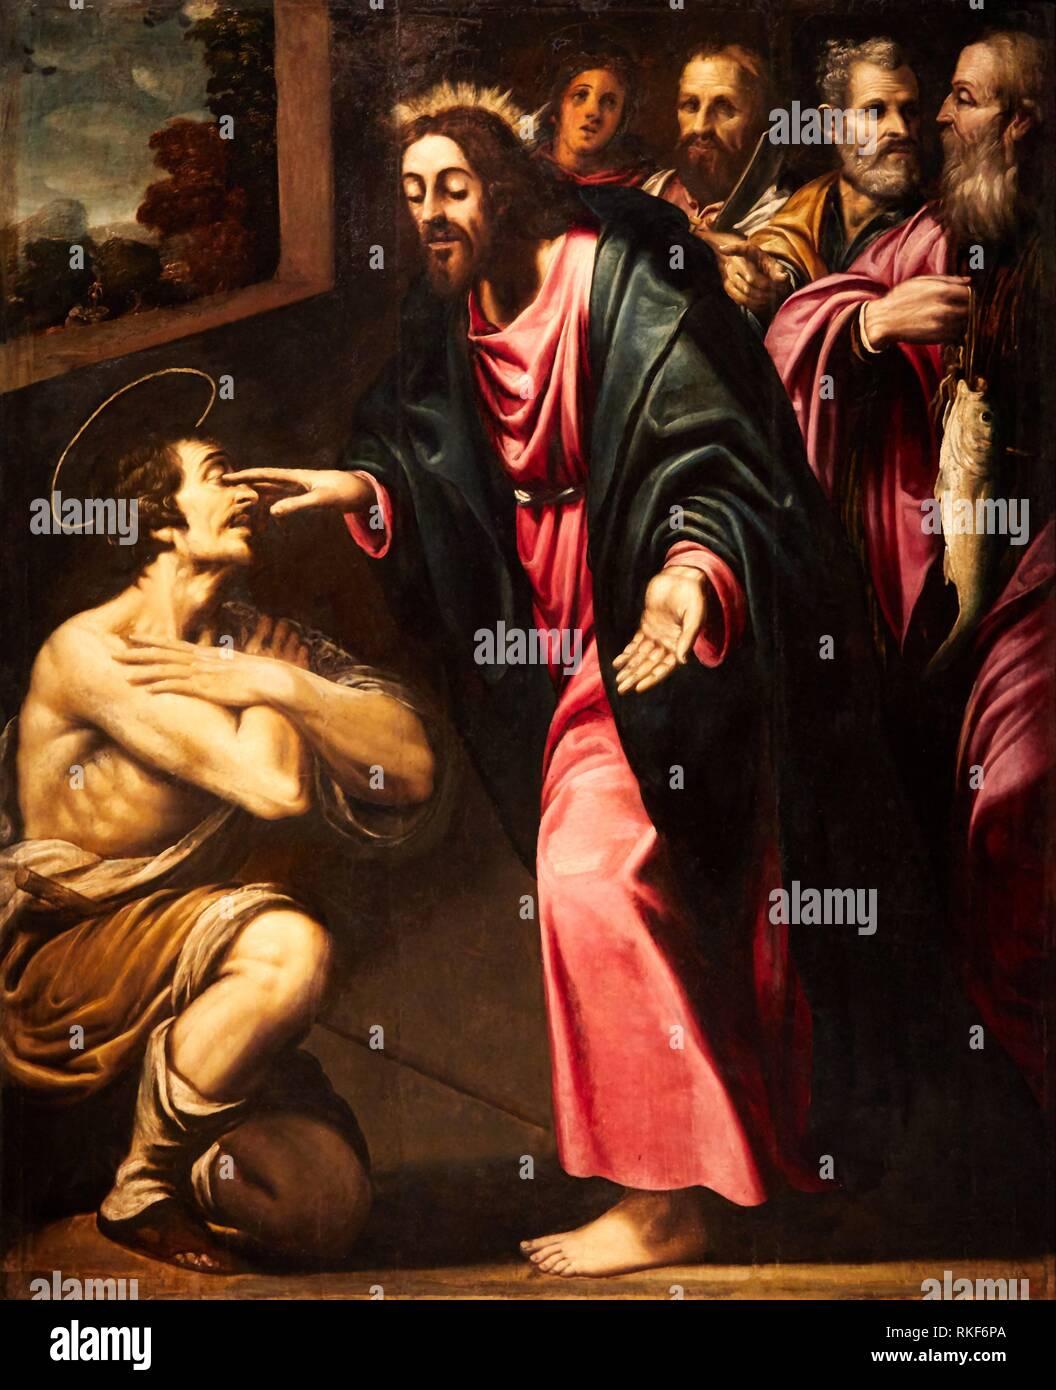 '''Jésus guérit l'aveuglement de Saint Restitude'', S. XVII, anonyme (Catalunya), Musée National d'Art Catalan, Museu Nacional d'Art de Catalunya, MNAC, Photo Stock